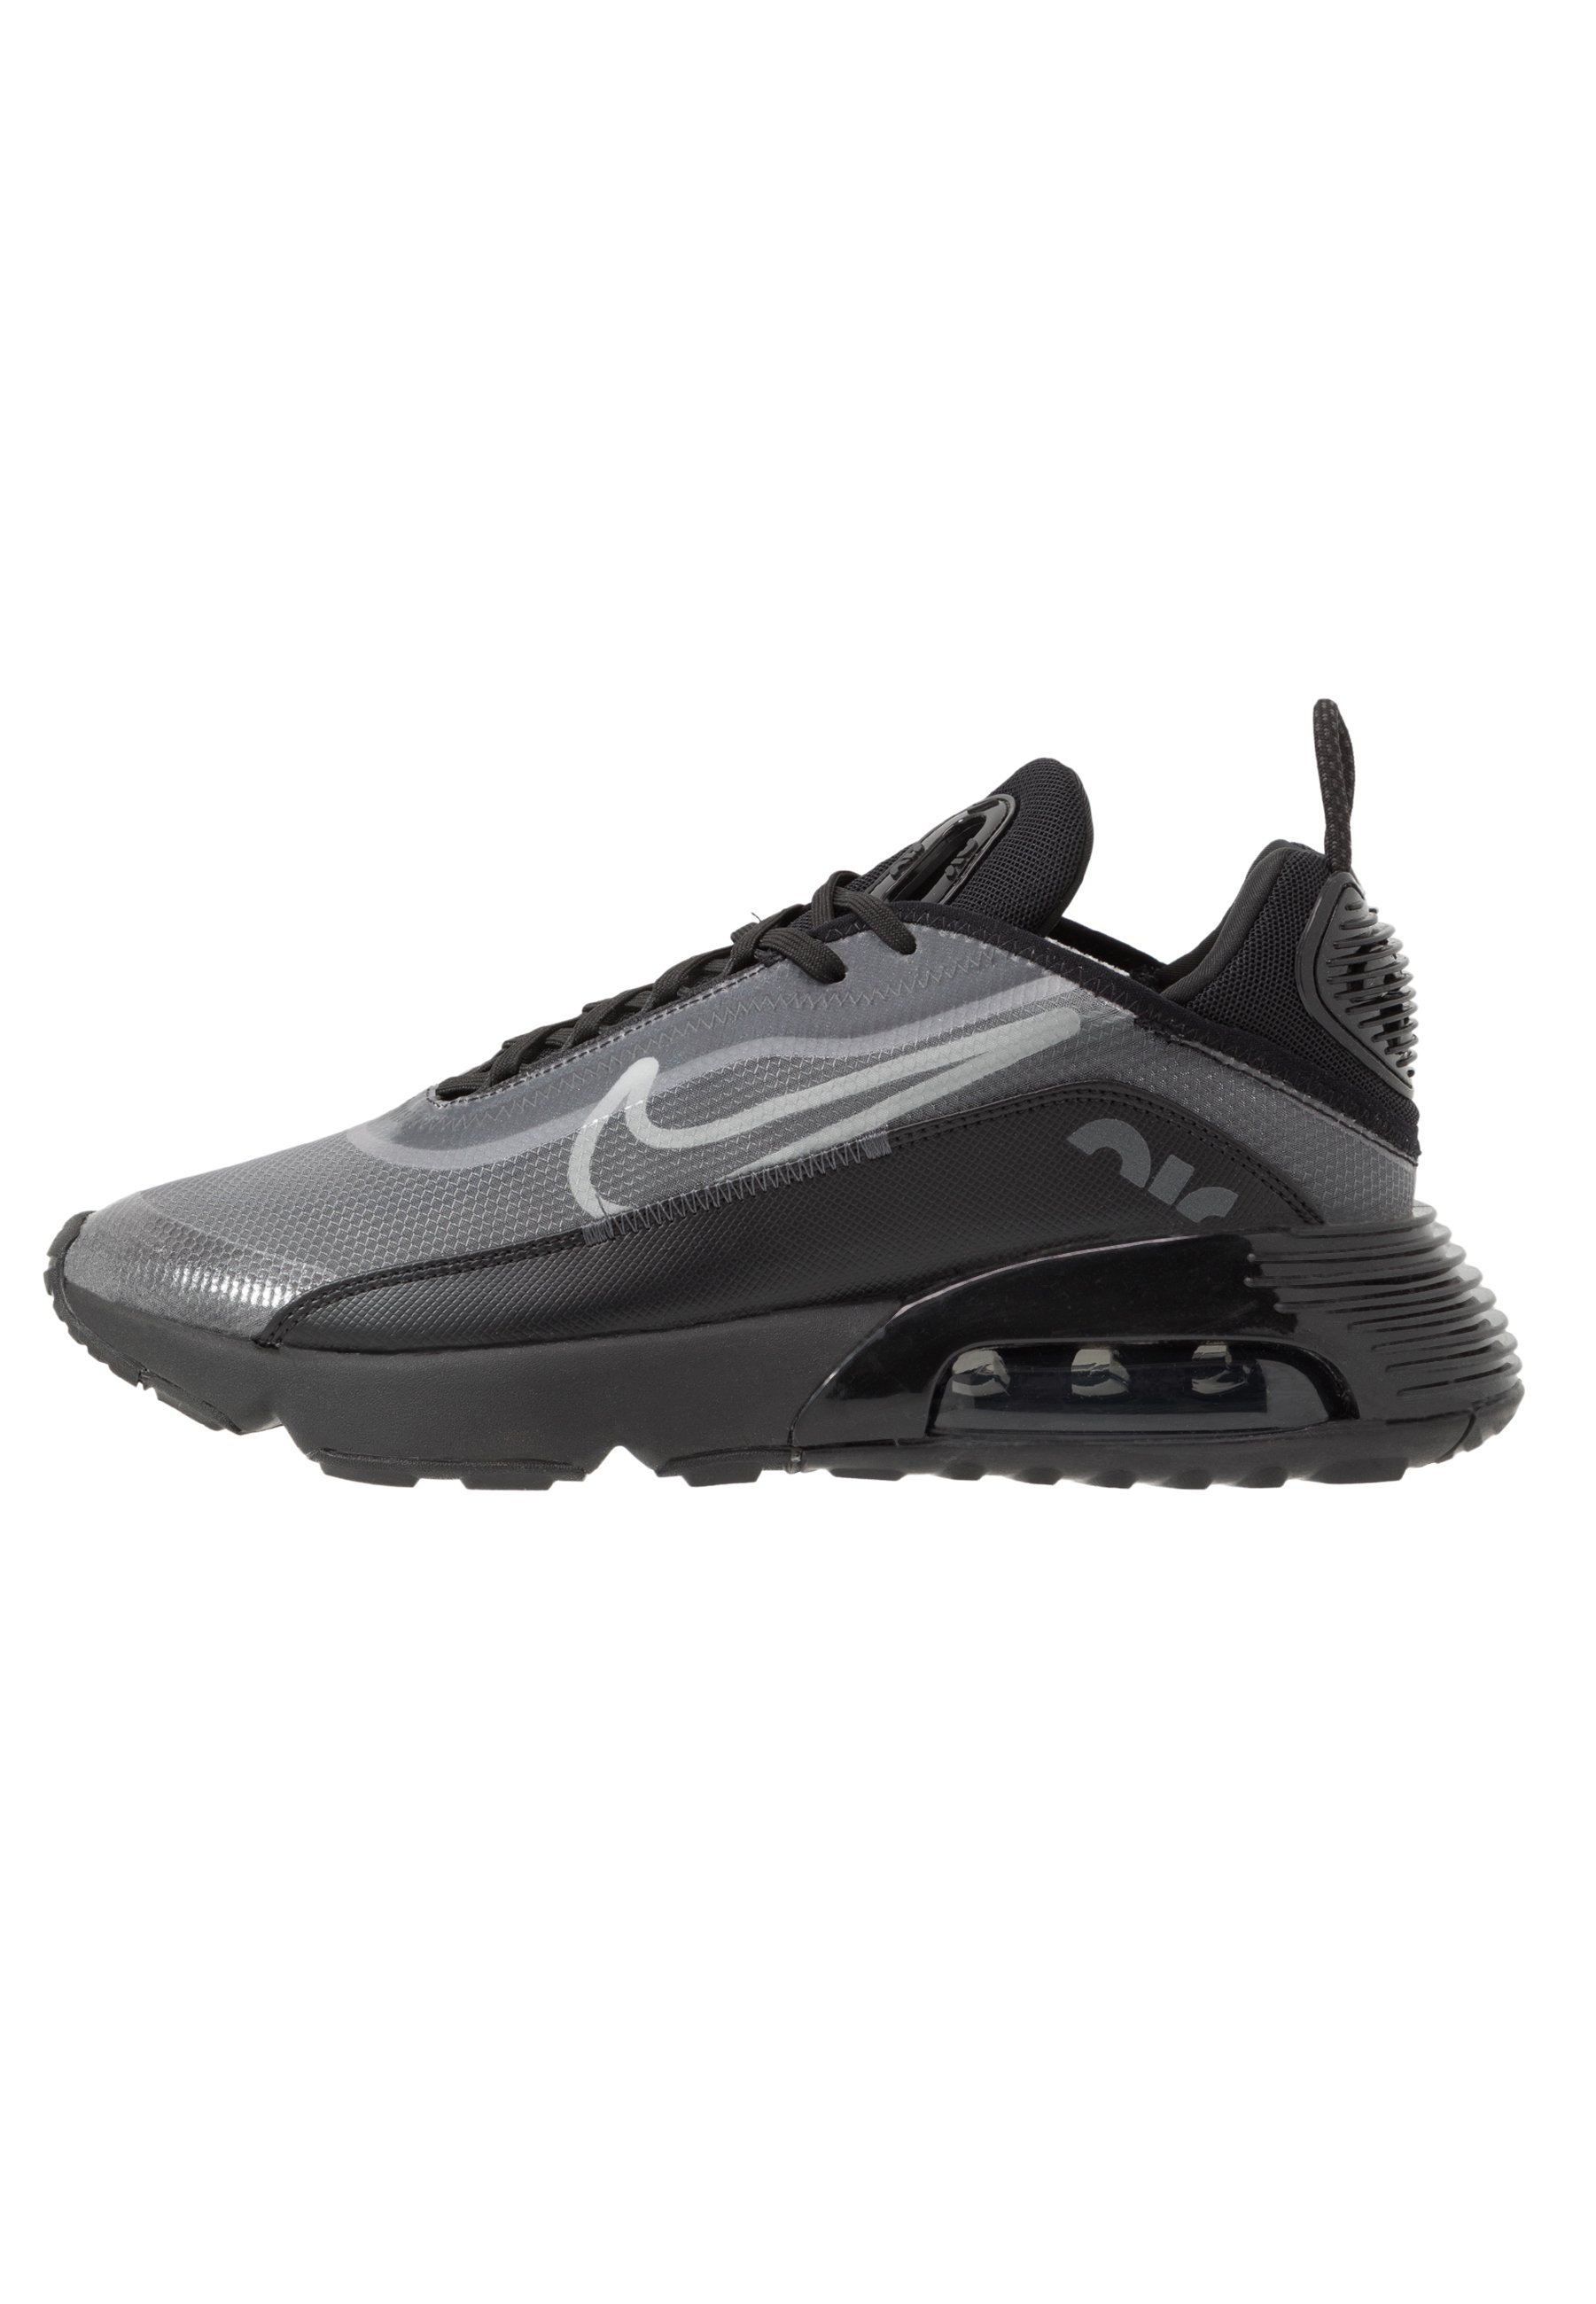 AIR MAX 2090 Sneakers basse blackwhitewolf greyanthracitereflect silver